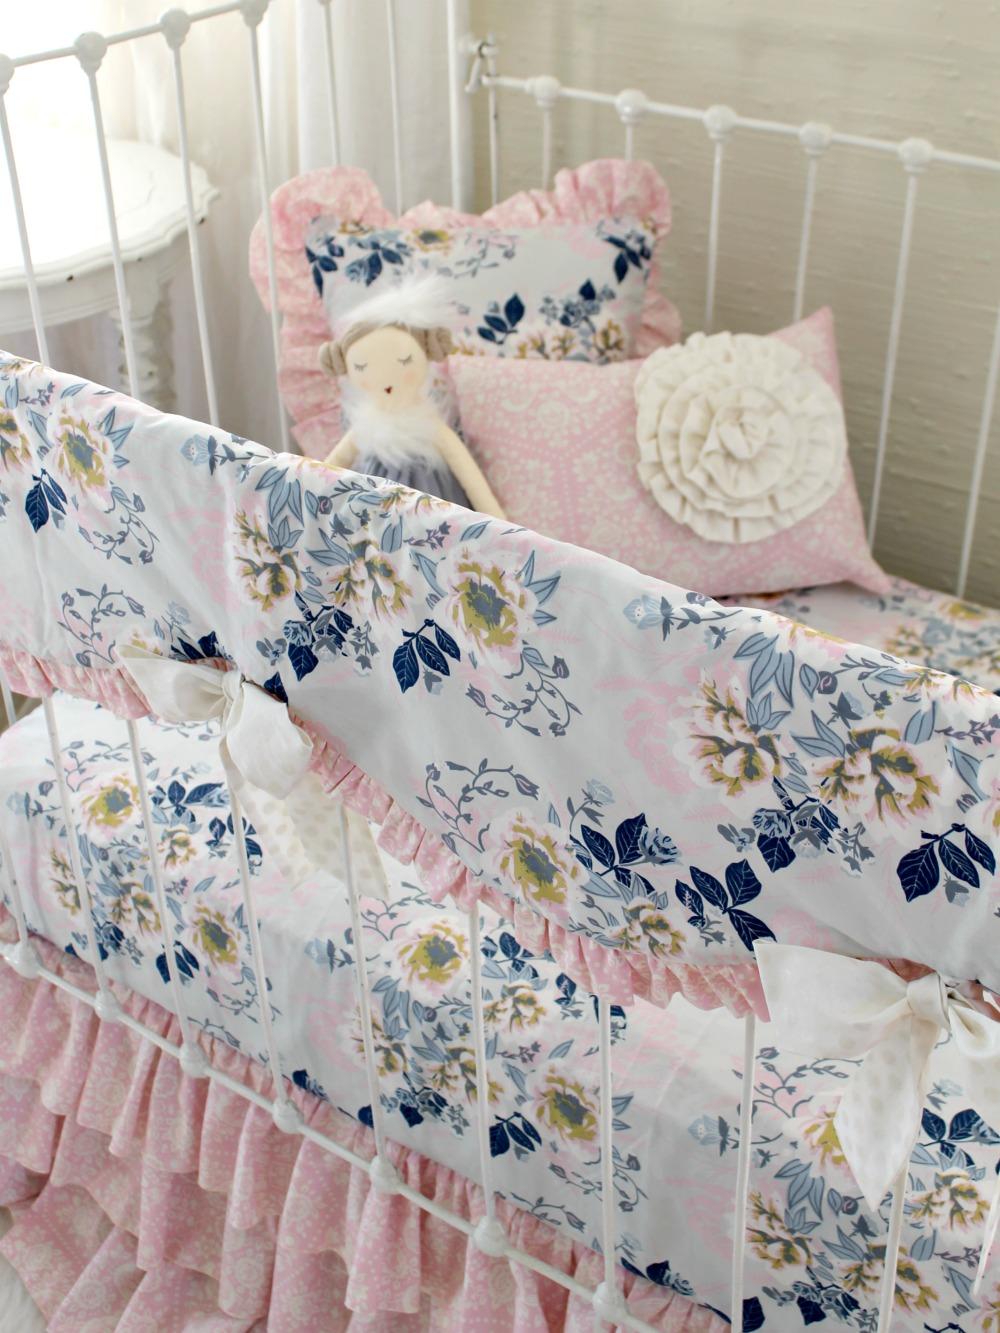 Ethereal Lullaby Blanket Bumperless Baby Bedding Lottie